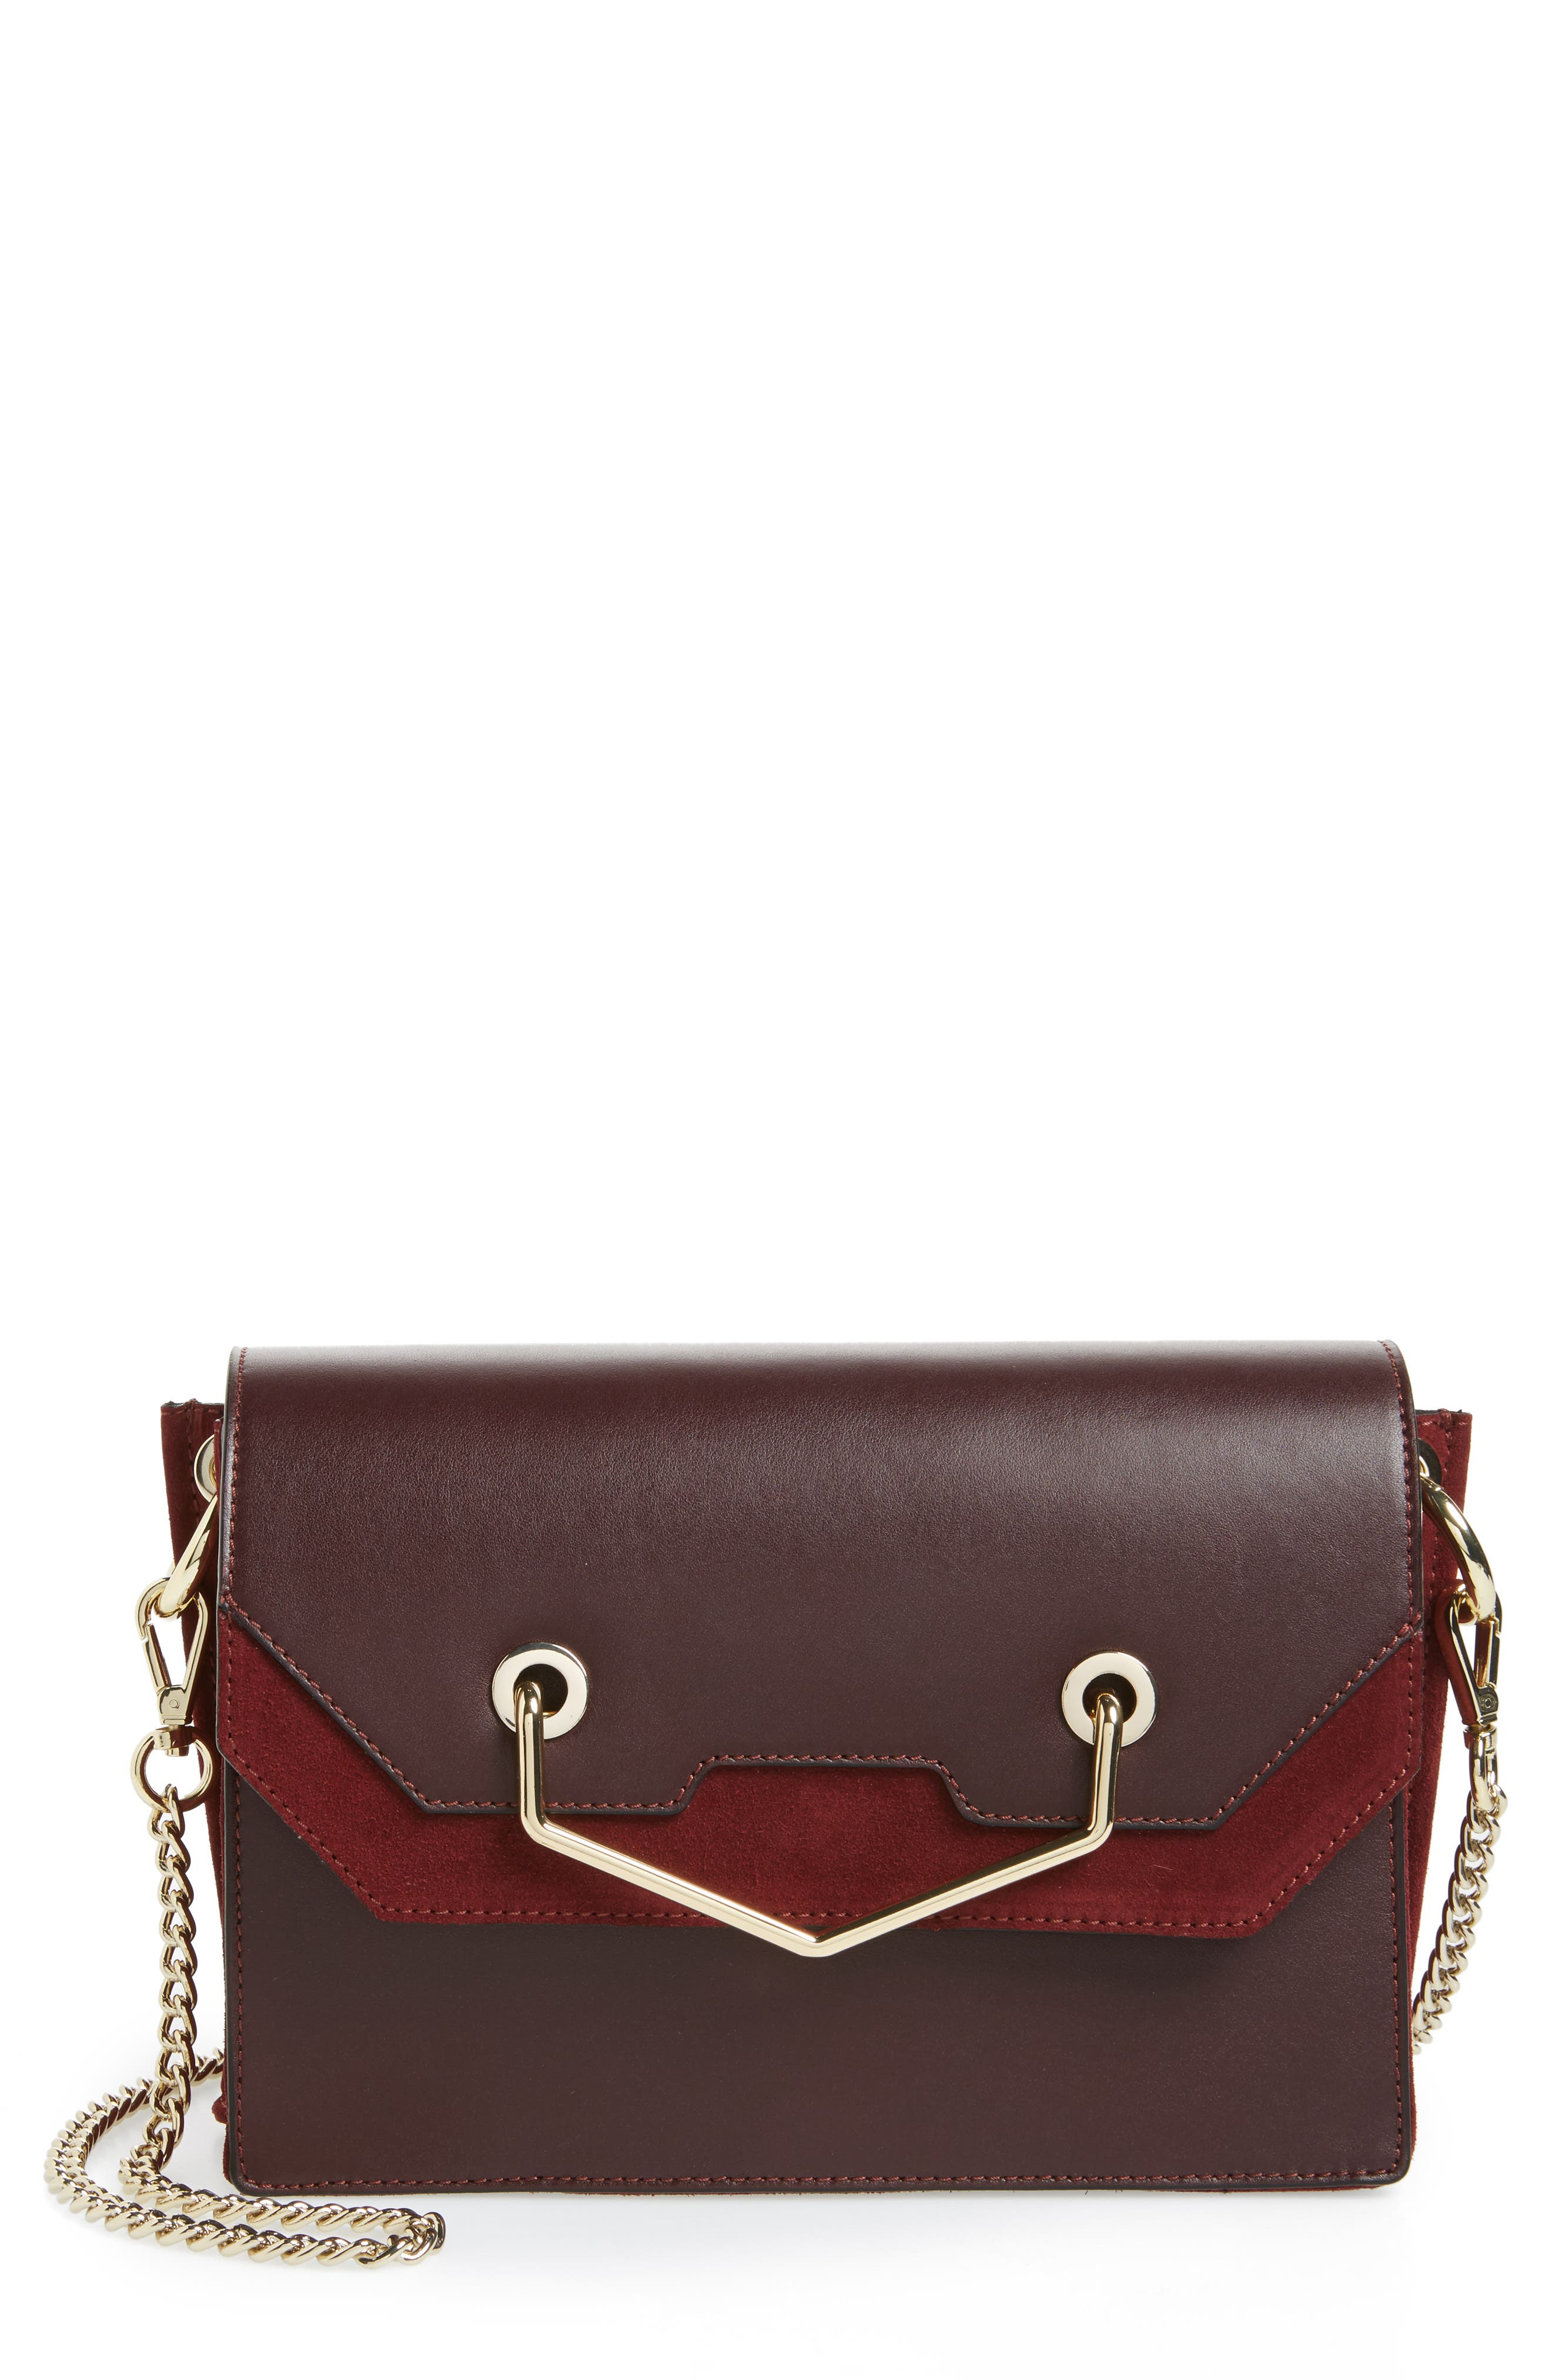 Alternate Image 1 Selected - Topshop Premium Leather & Suede Soko Shoulder Bag